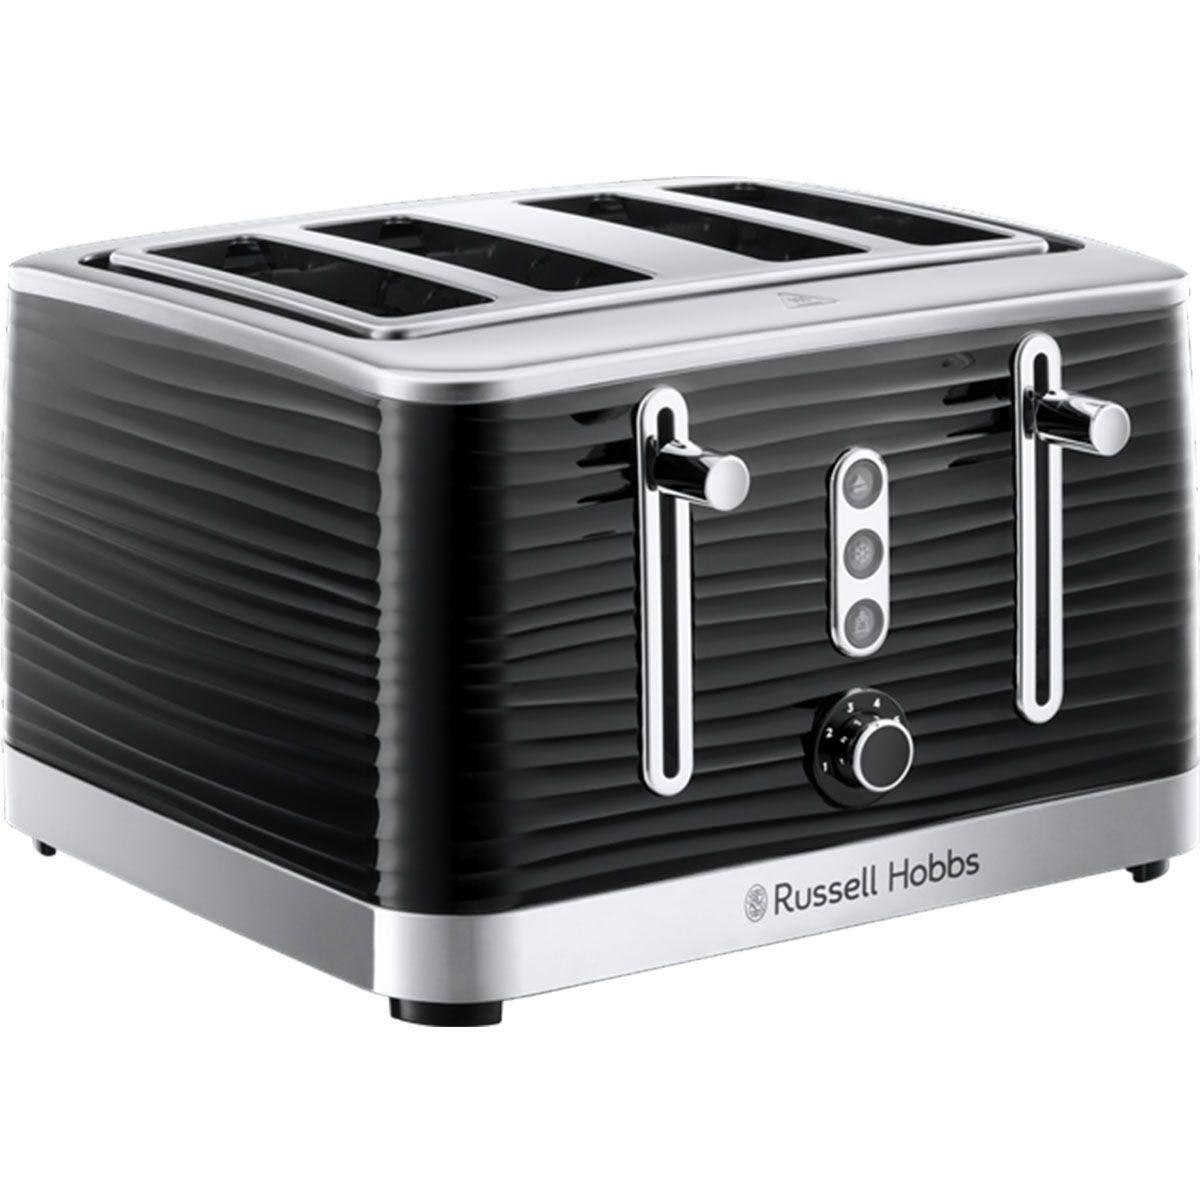 Russell Hobbs 24381 Inspire 4 Slot Toaster - Black